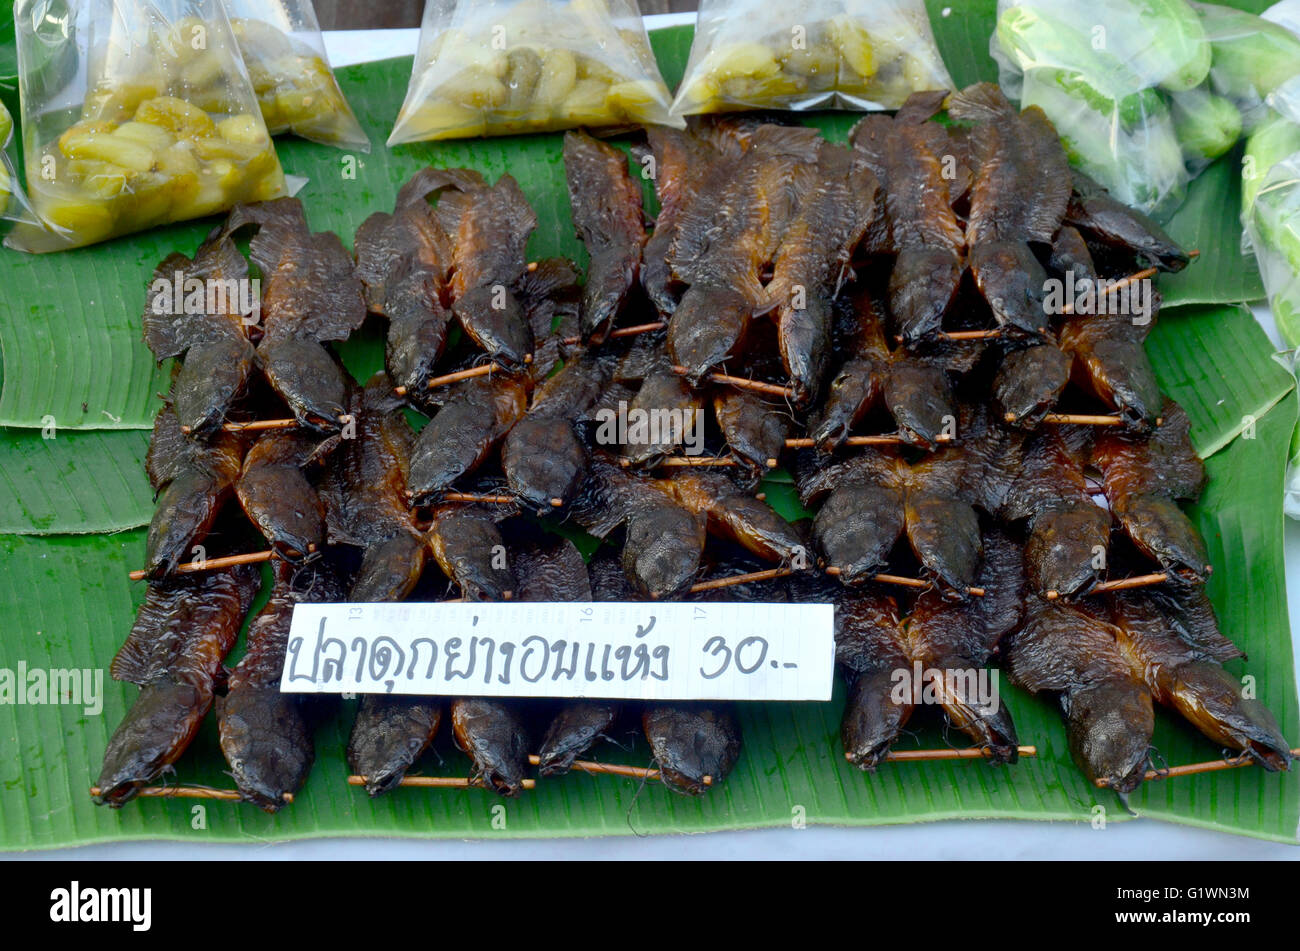 Walking Catfish Stock Photos & Walking Catfish Stock ... - photo#27